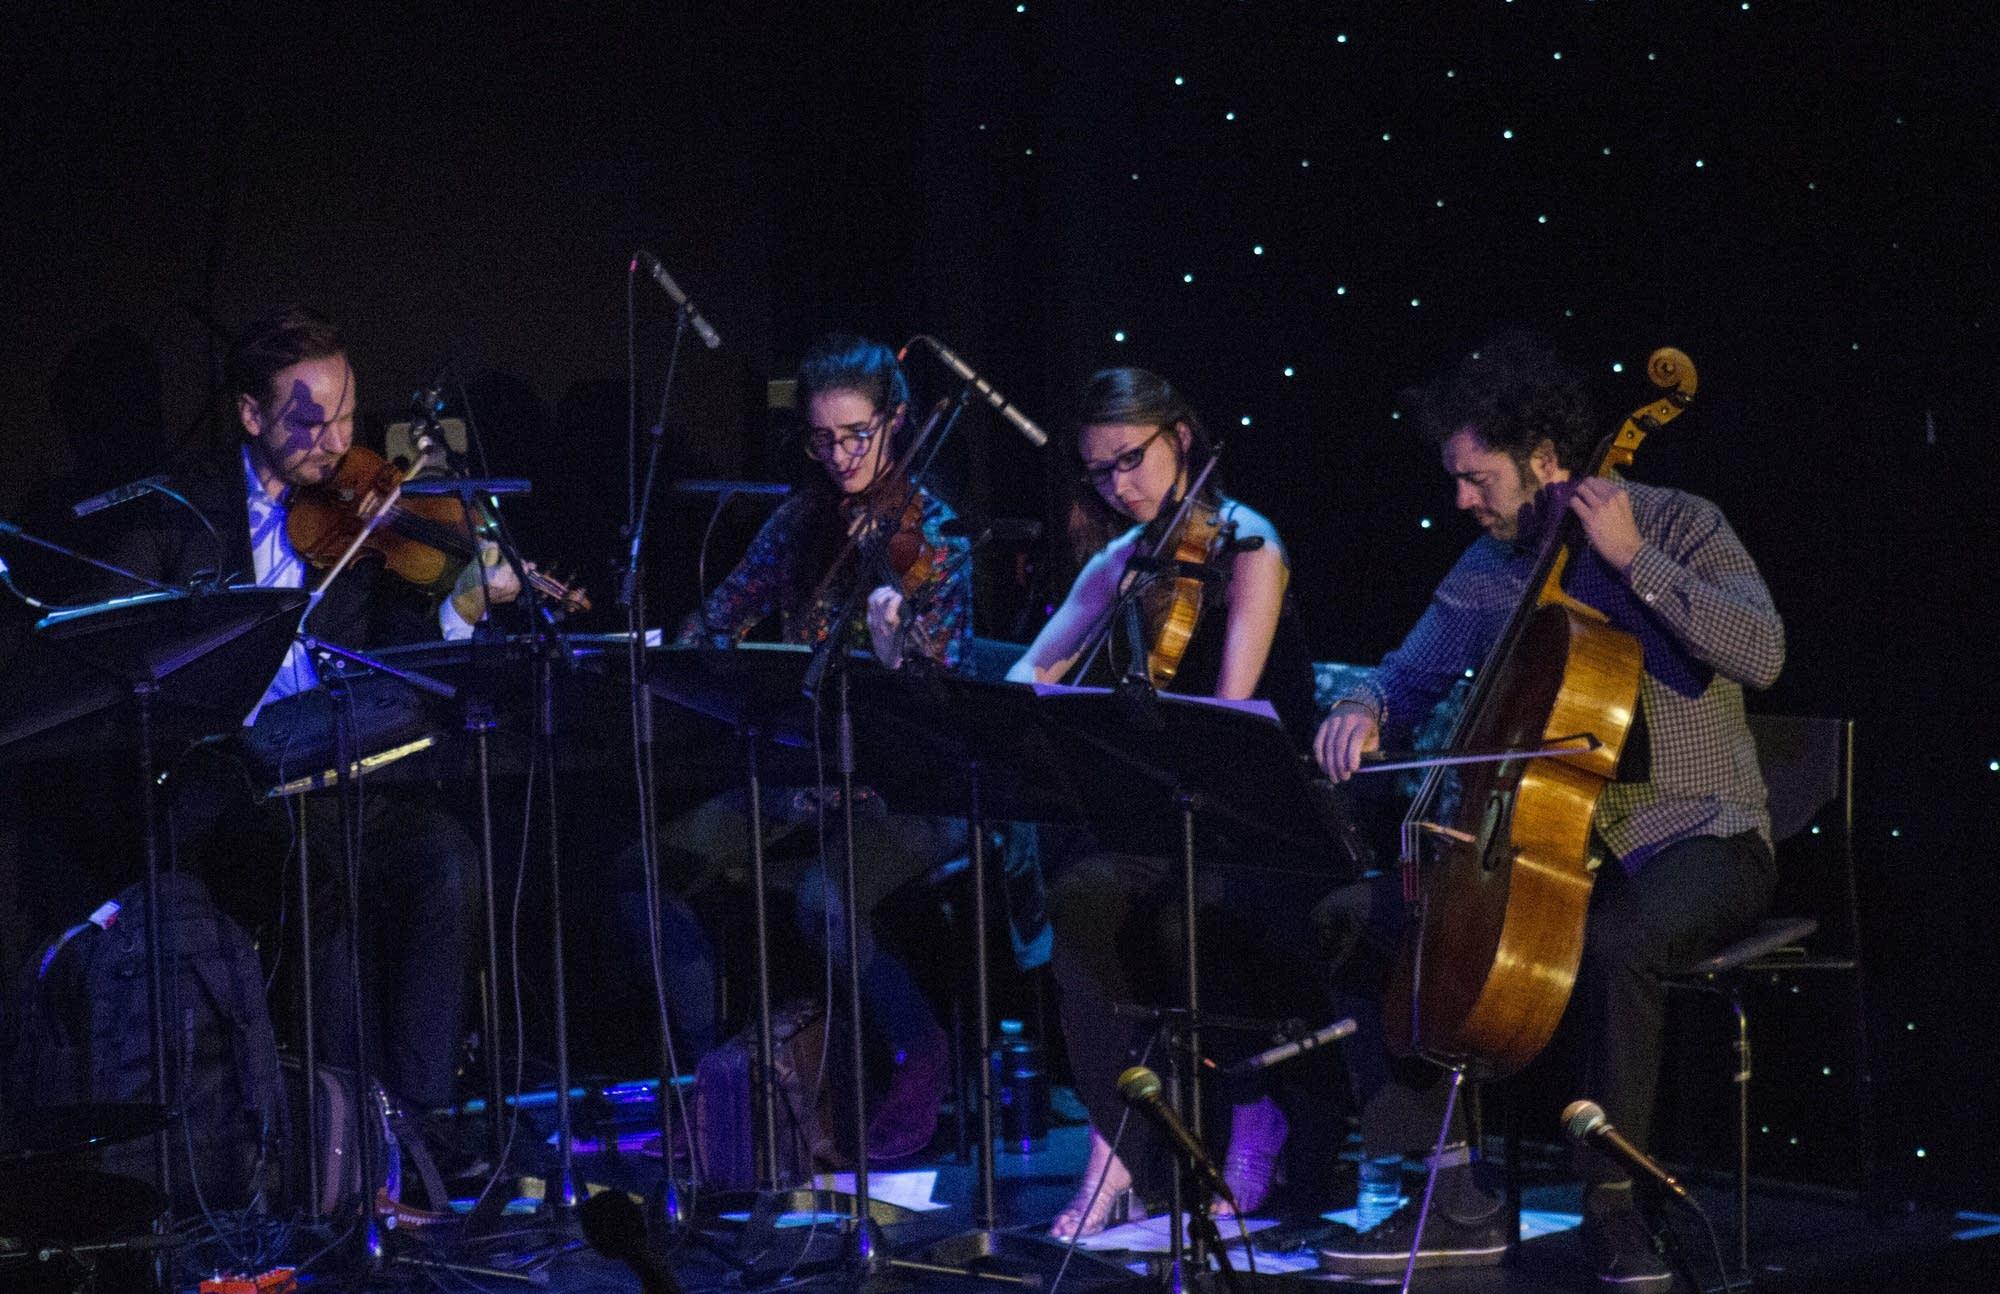 Edinburgh - 10 - The Knights Quartet